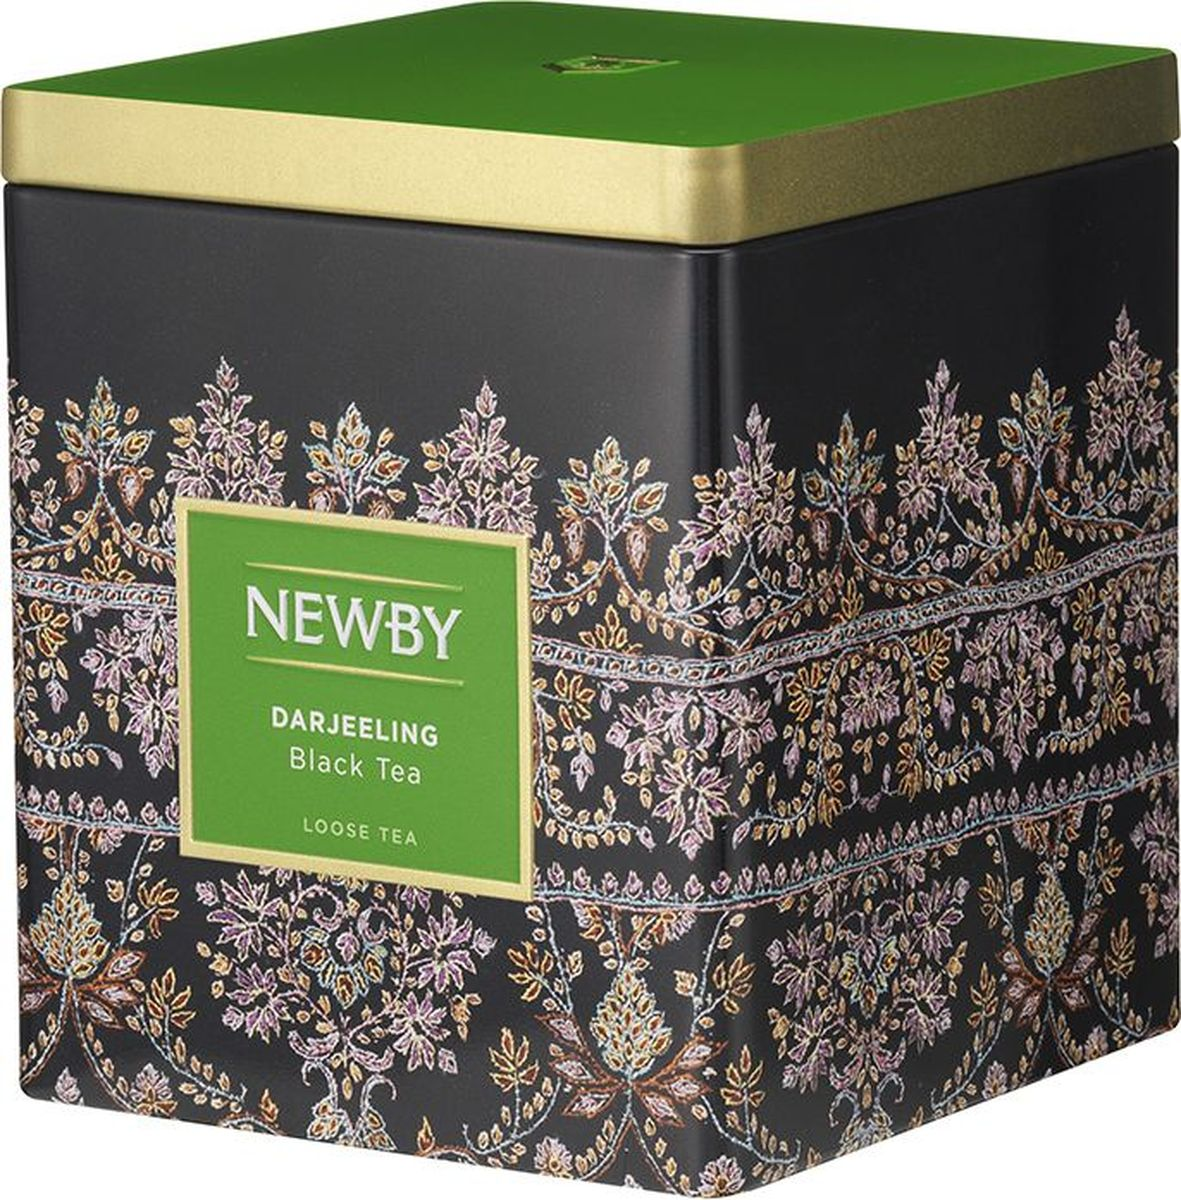 Newby Darjeeling черный листовой чай, 125 г greenfield fine darjeeling черный листовой чай 100 г